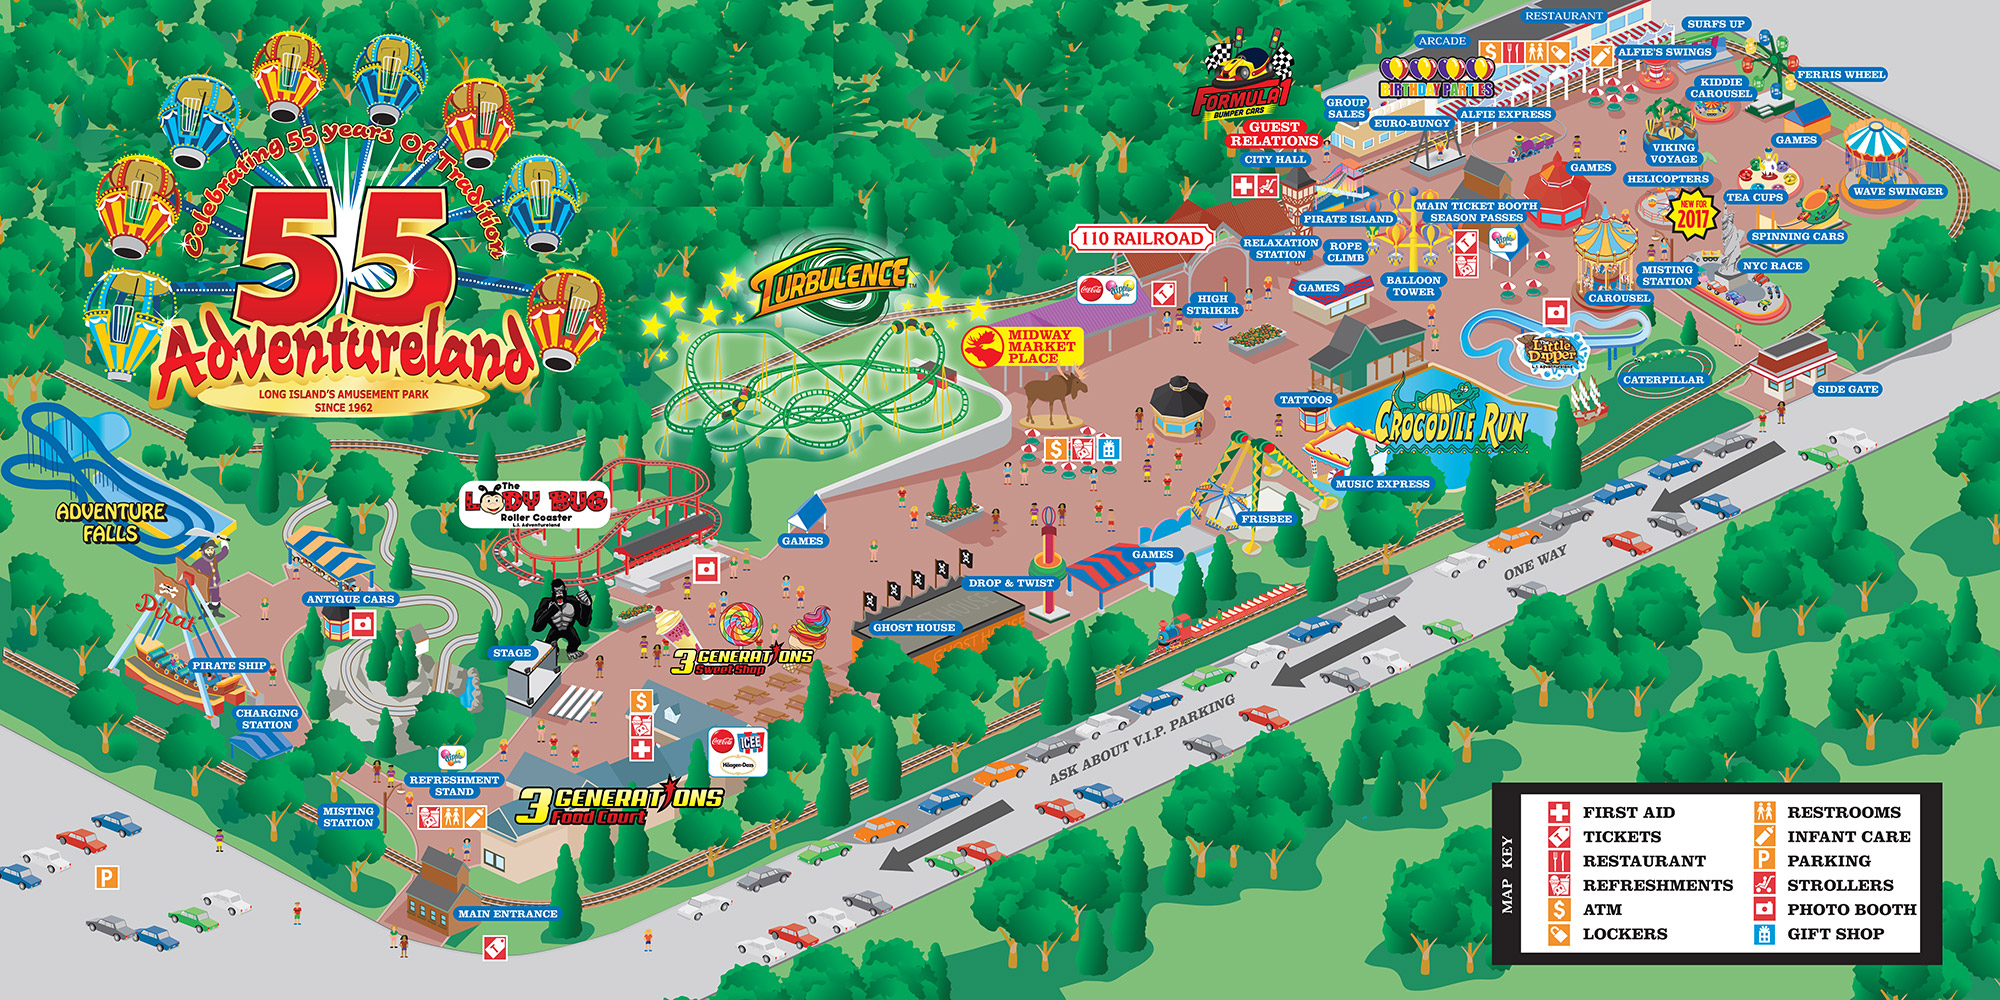 Adventureland Amusement Park Attractions Map Adventureland